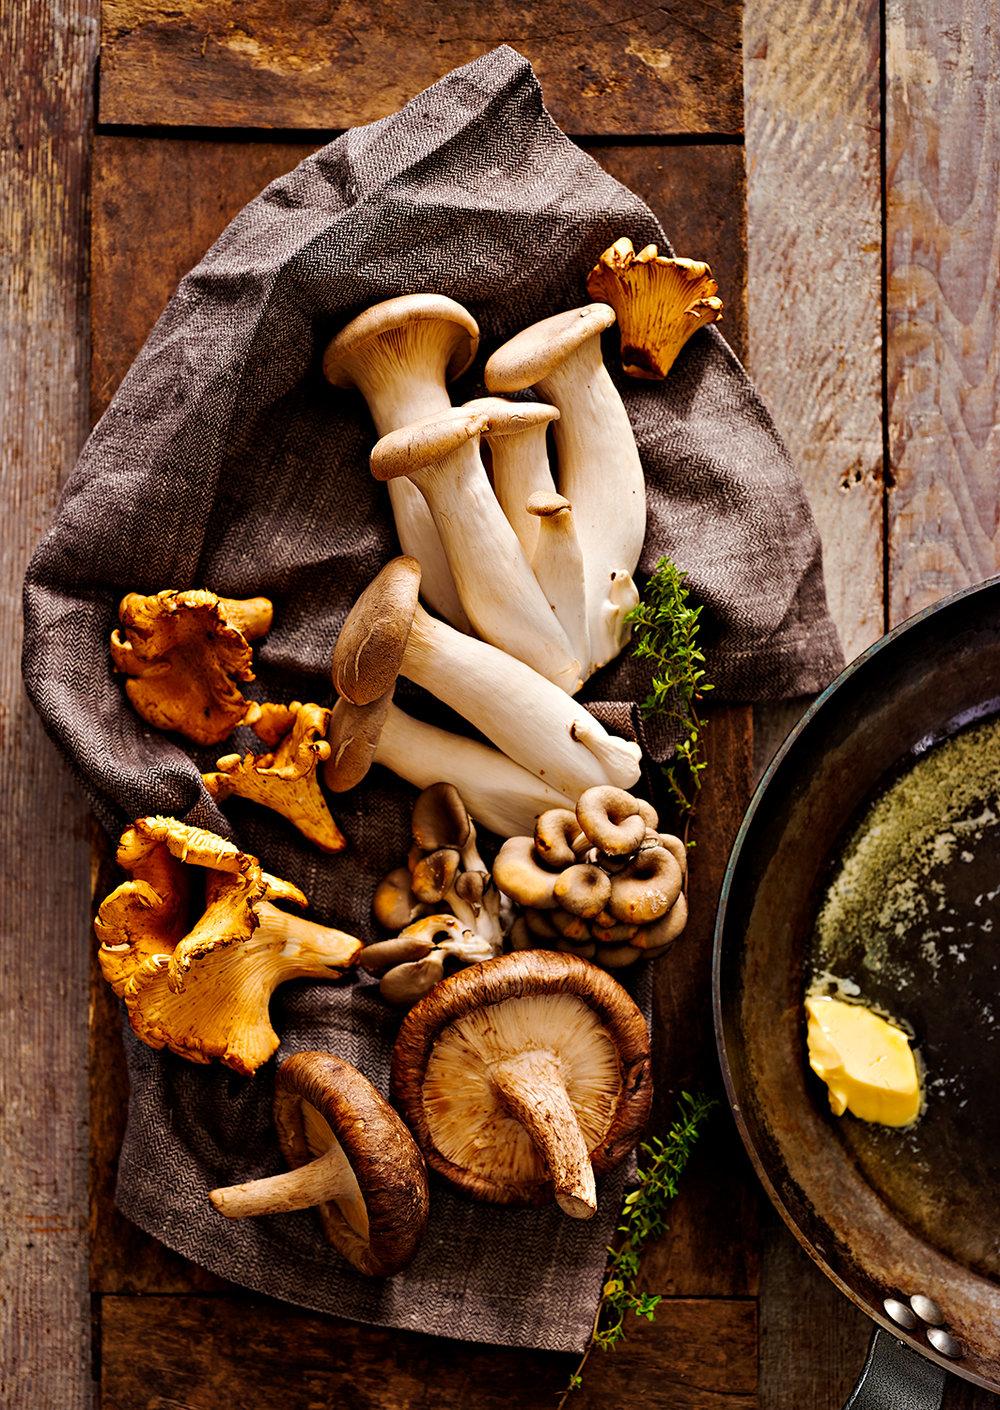 05_mushrooms.jpg